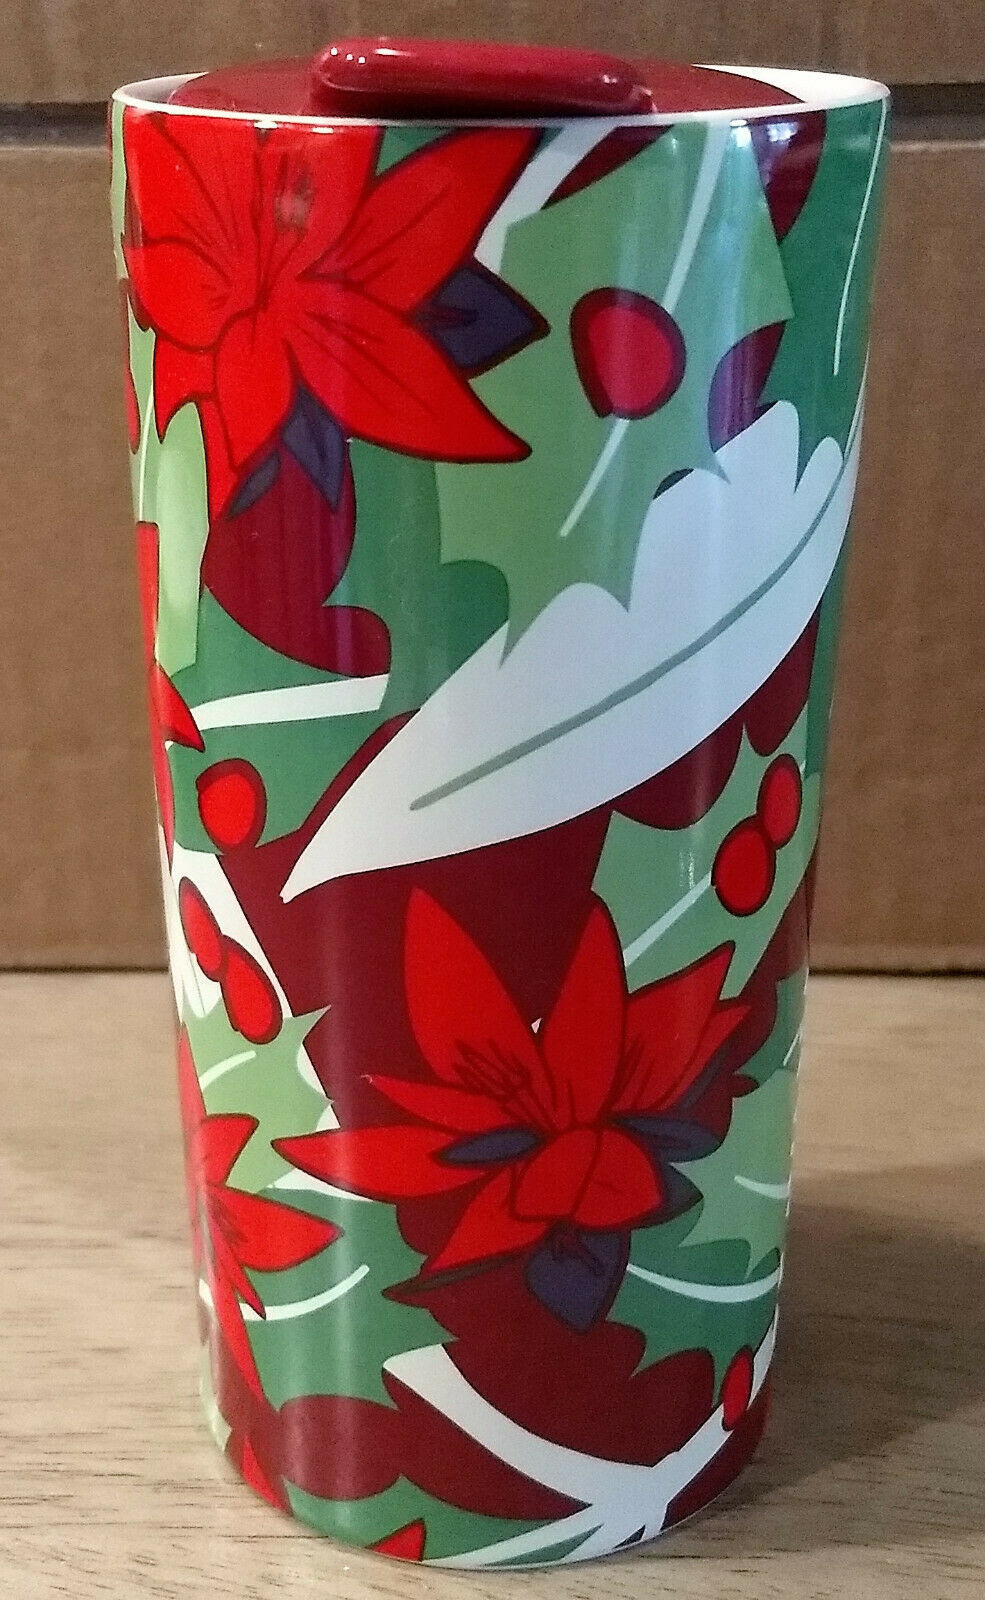 Teavana Floral Travel Tumbler Coffee Tea Cup Ceramic with Lid - Ex - See pics - $18.00